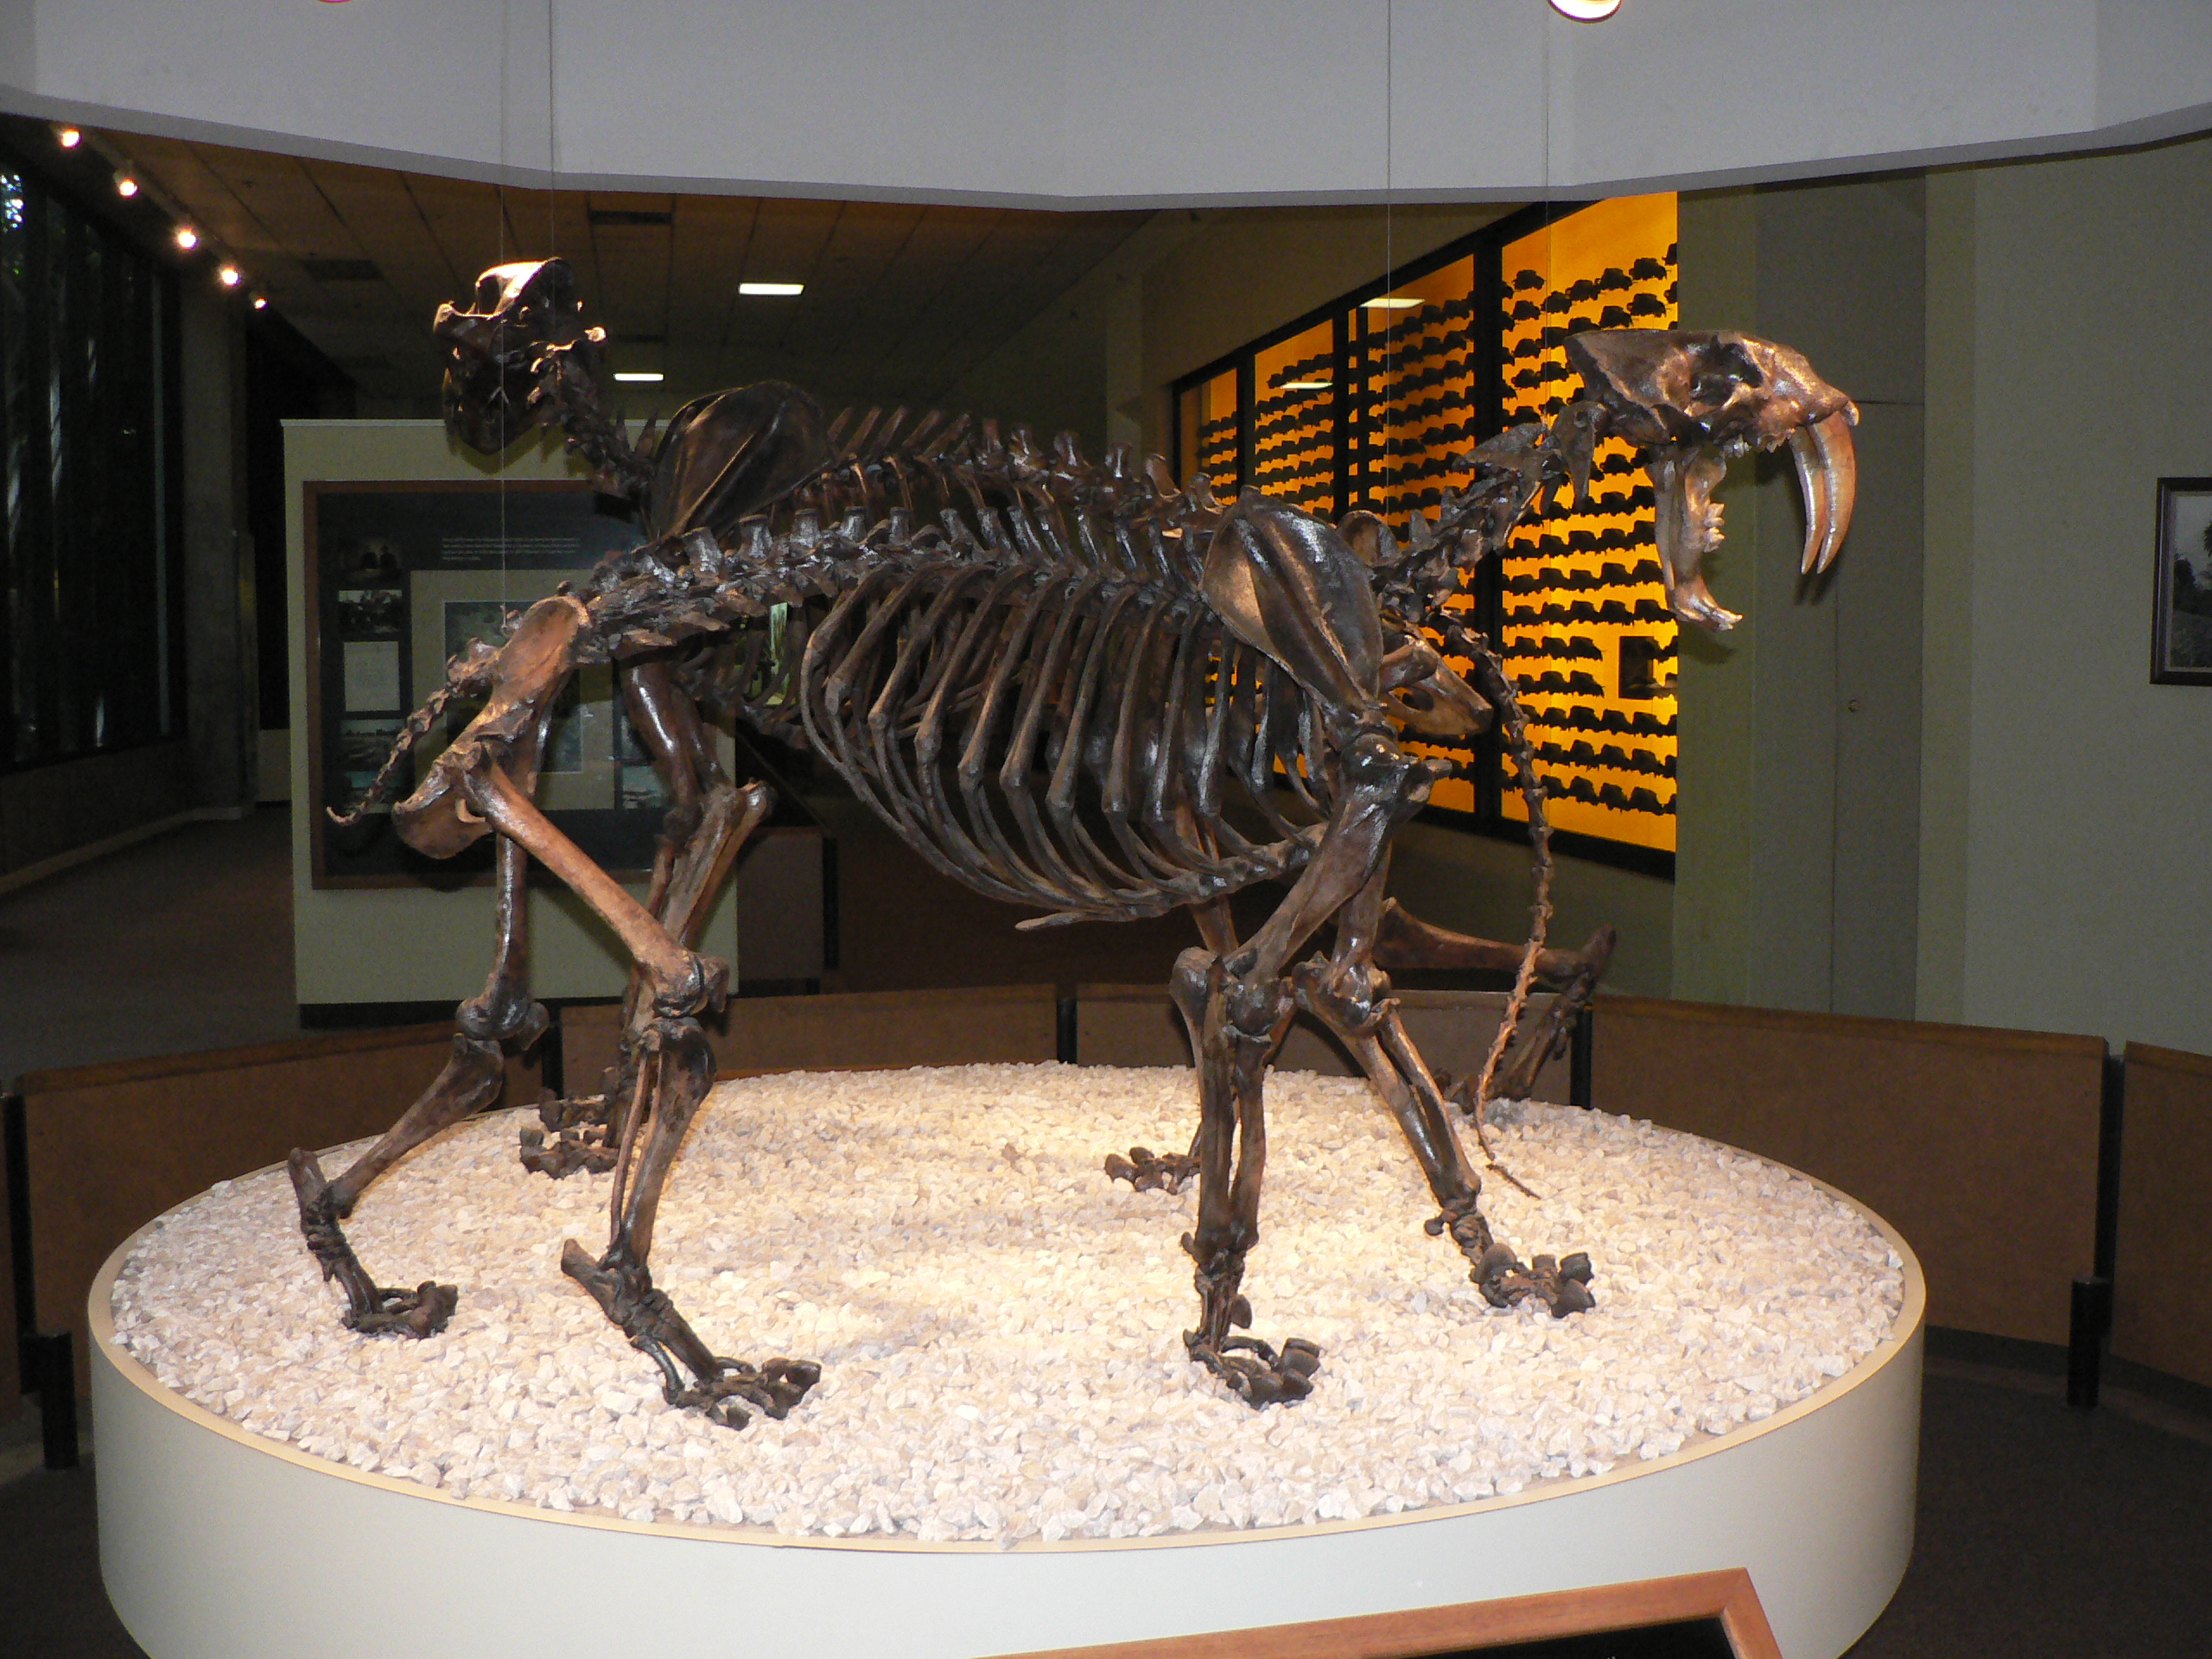 Smilodon Fossil Stock Photos & Smilodon Fossil Stock Images - Alamy